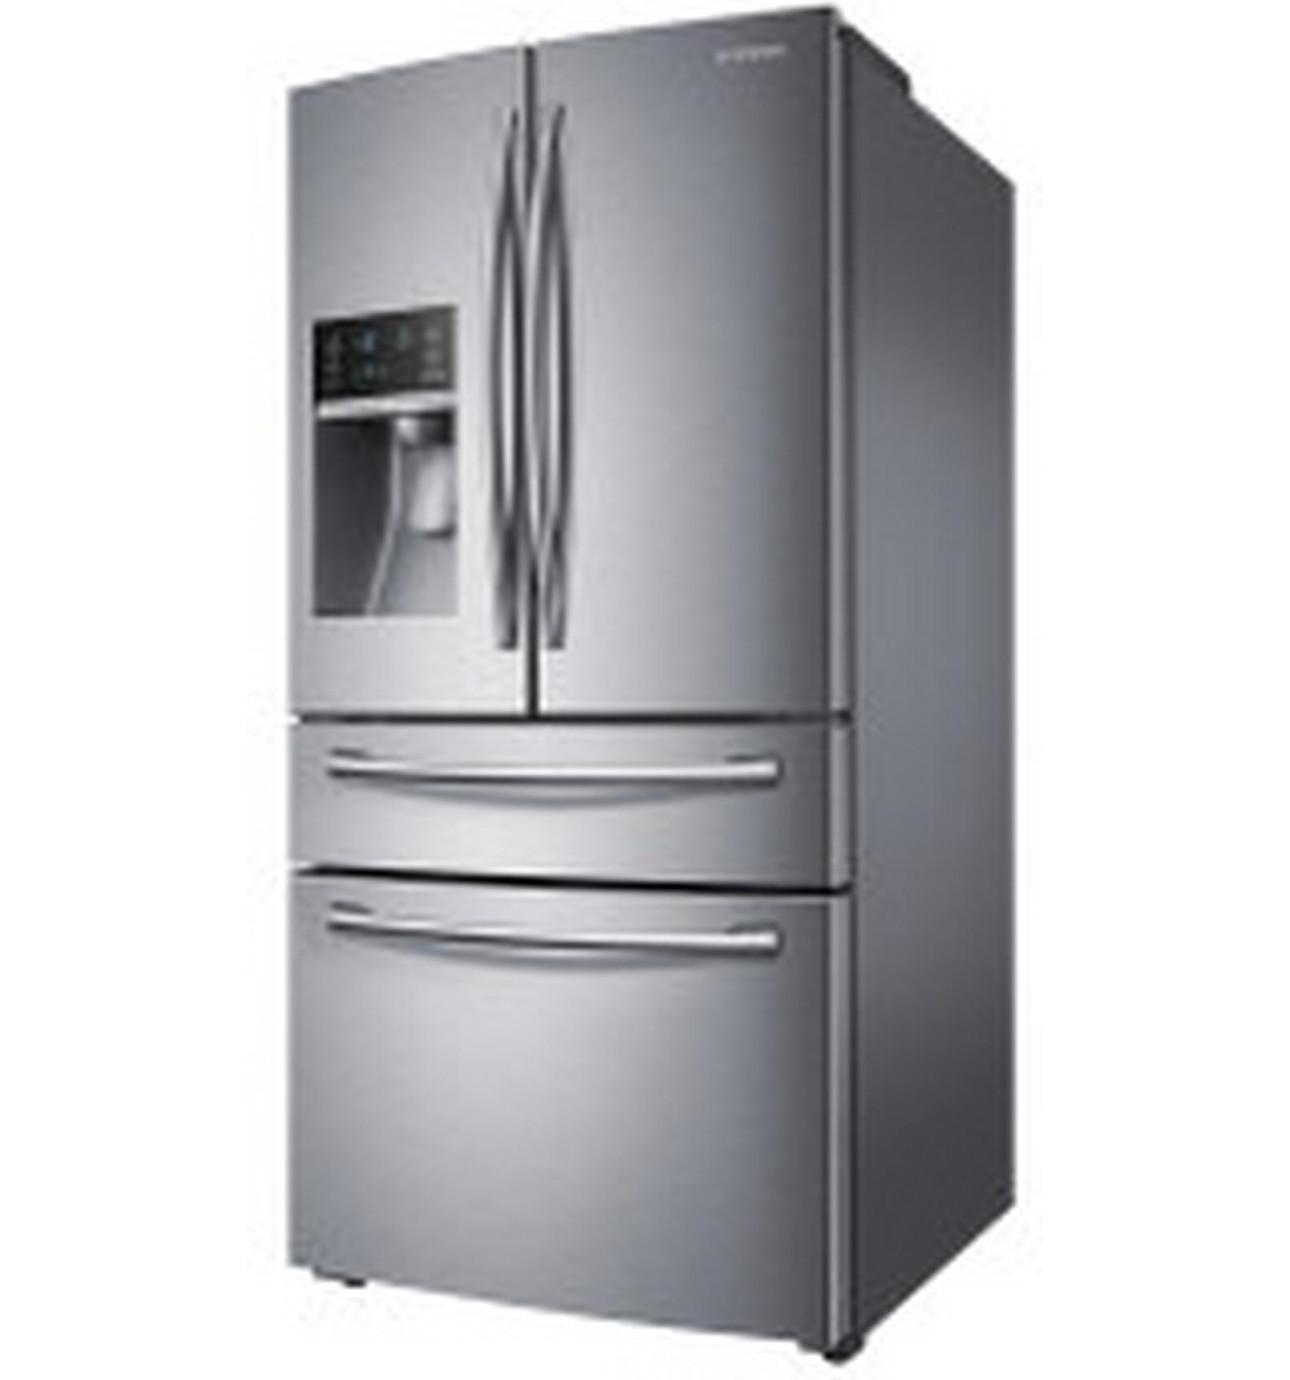 srf800gdls 836l french door fridge